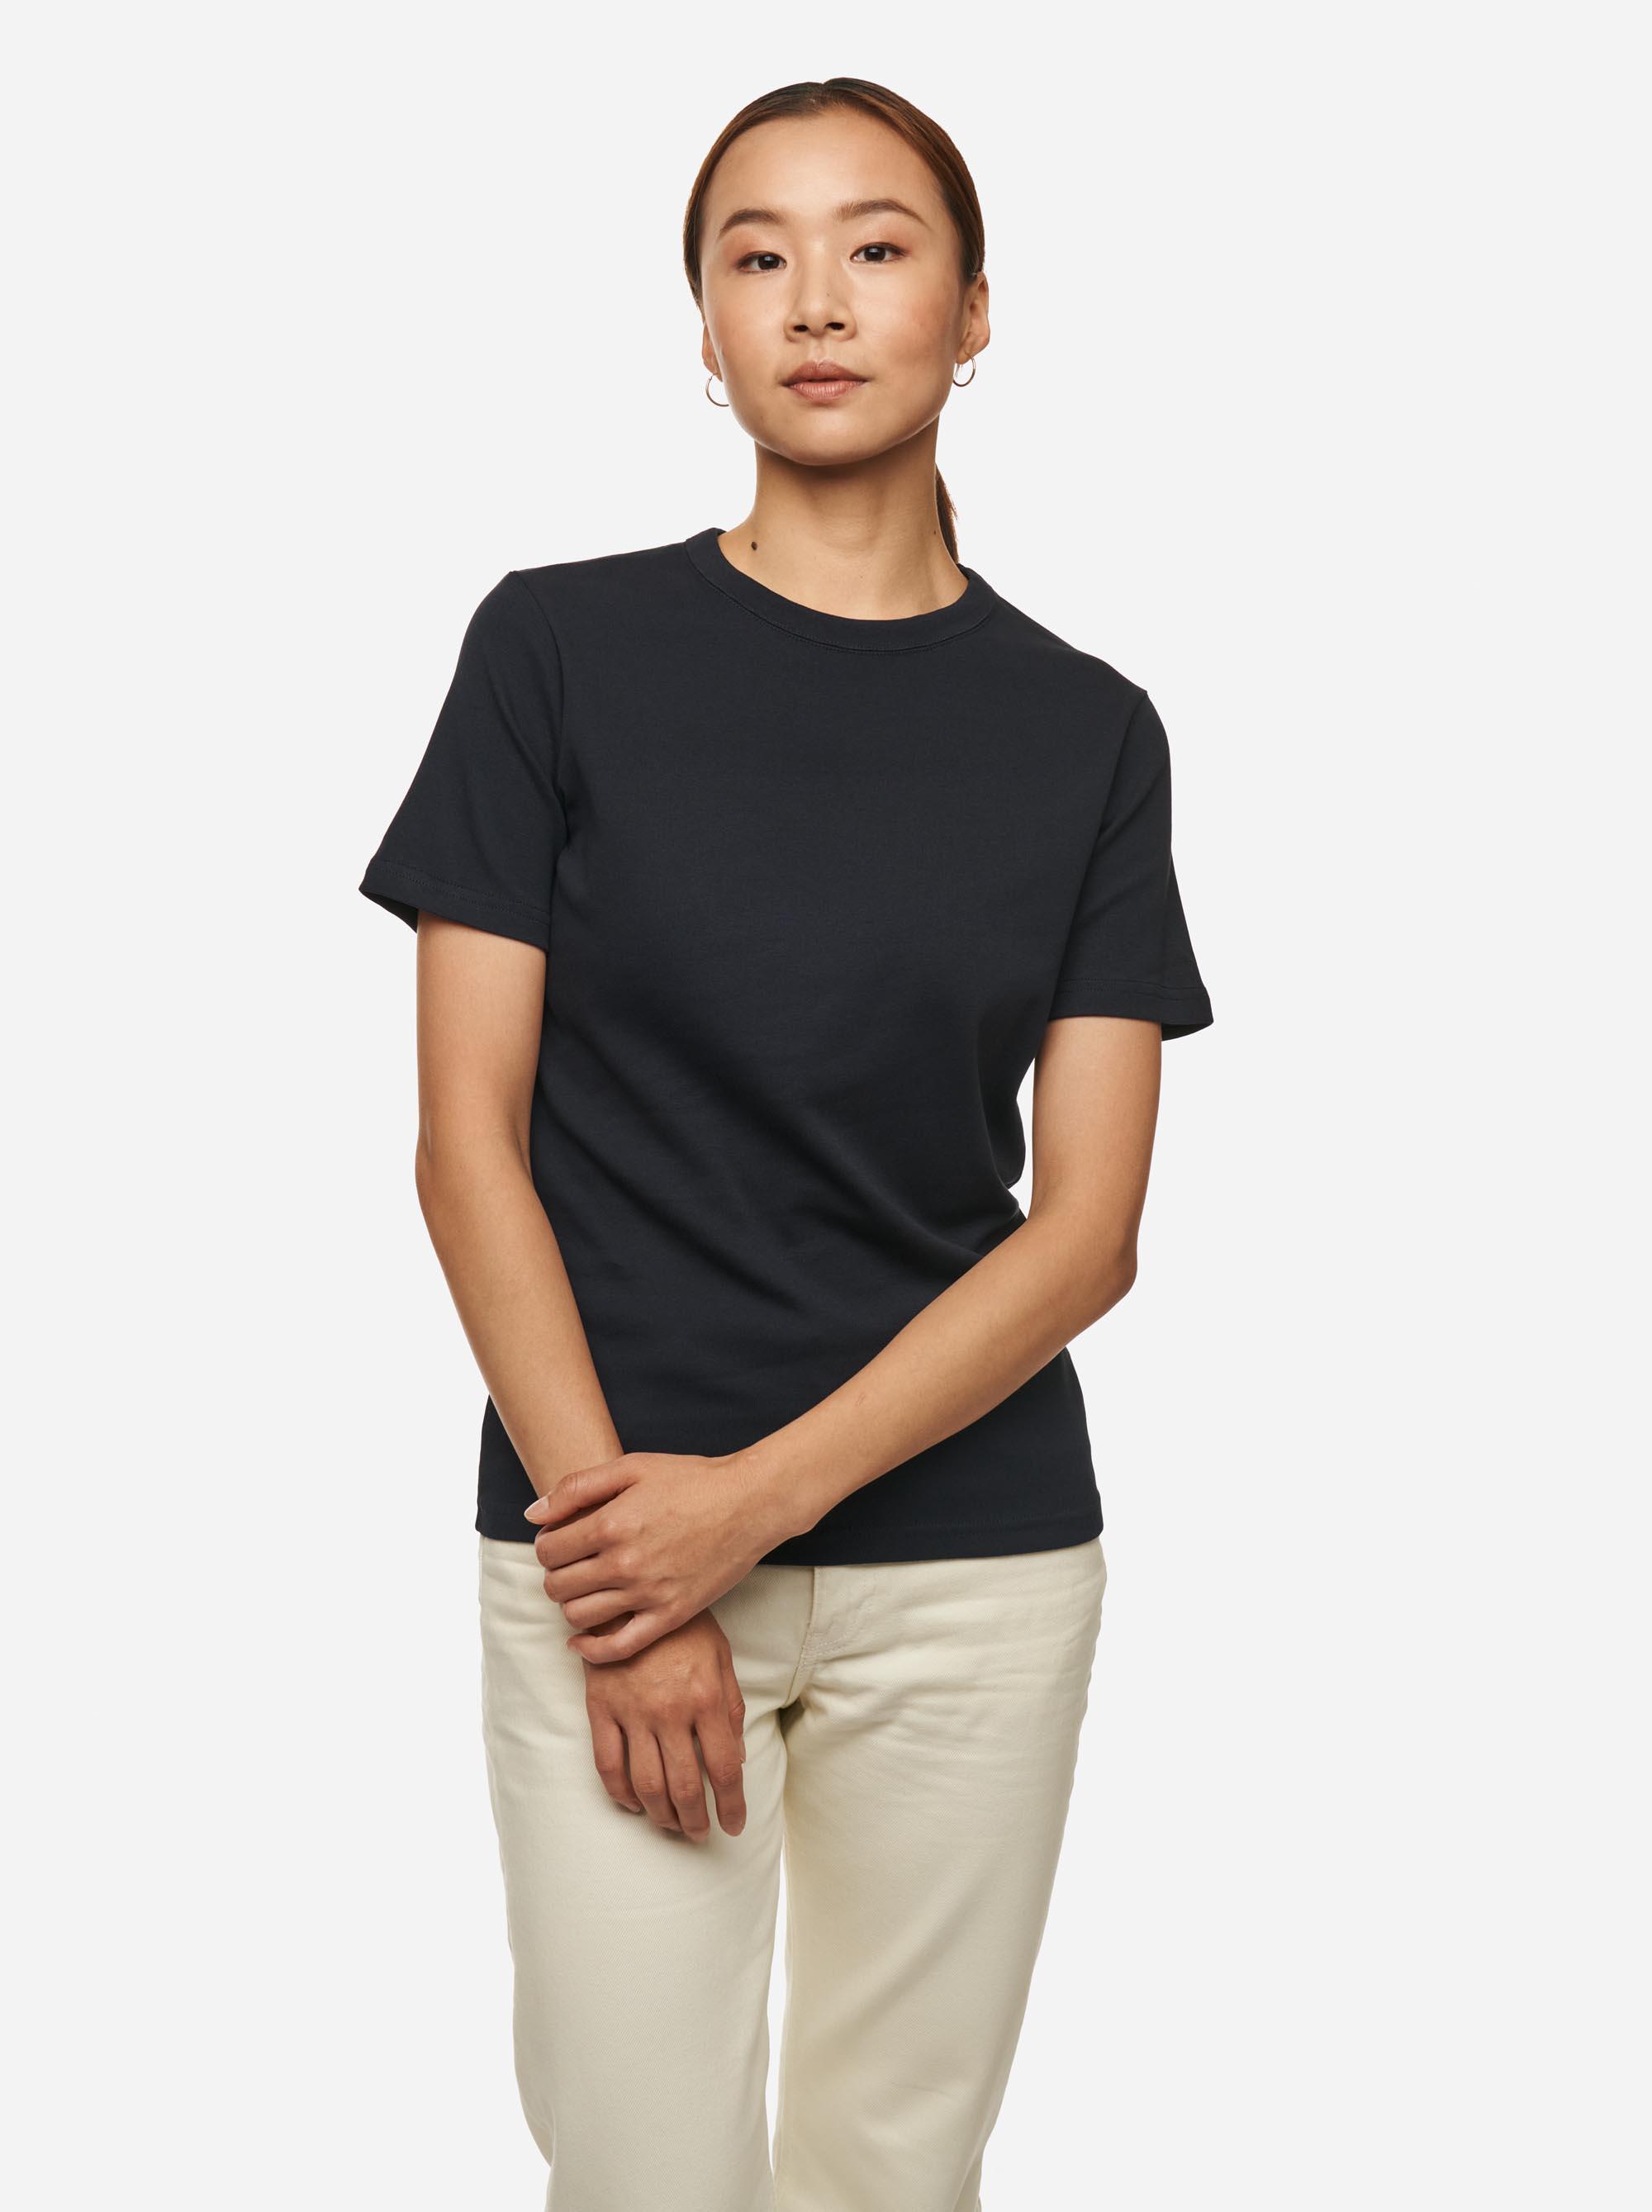 Teym - The T-Shirt - Women - Blue - 1